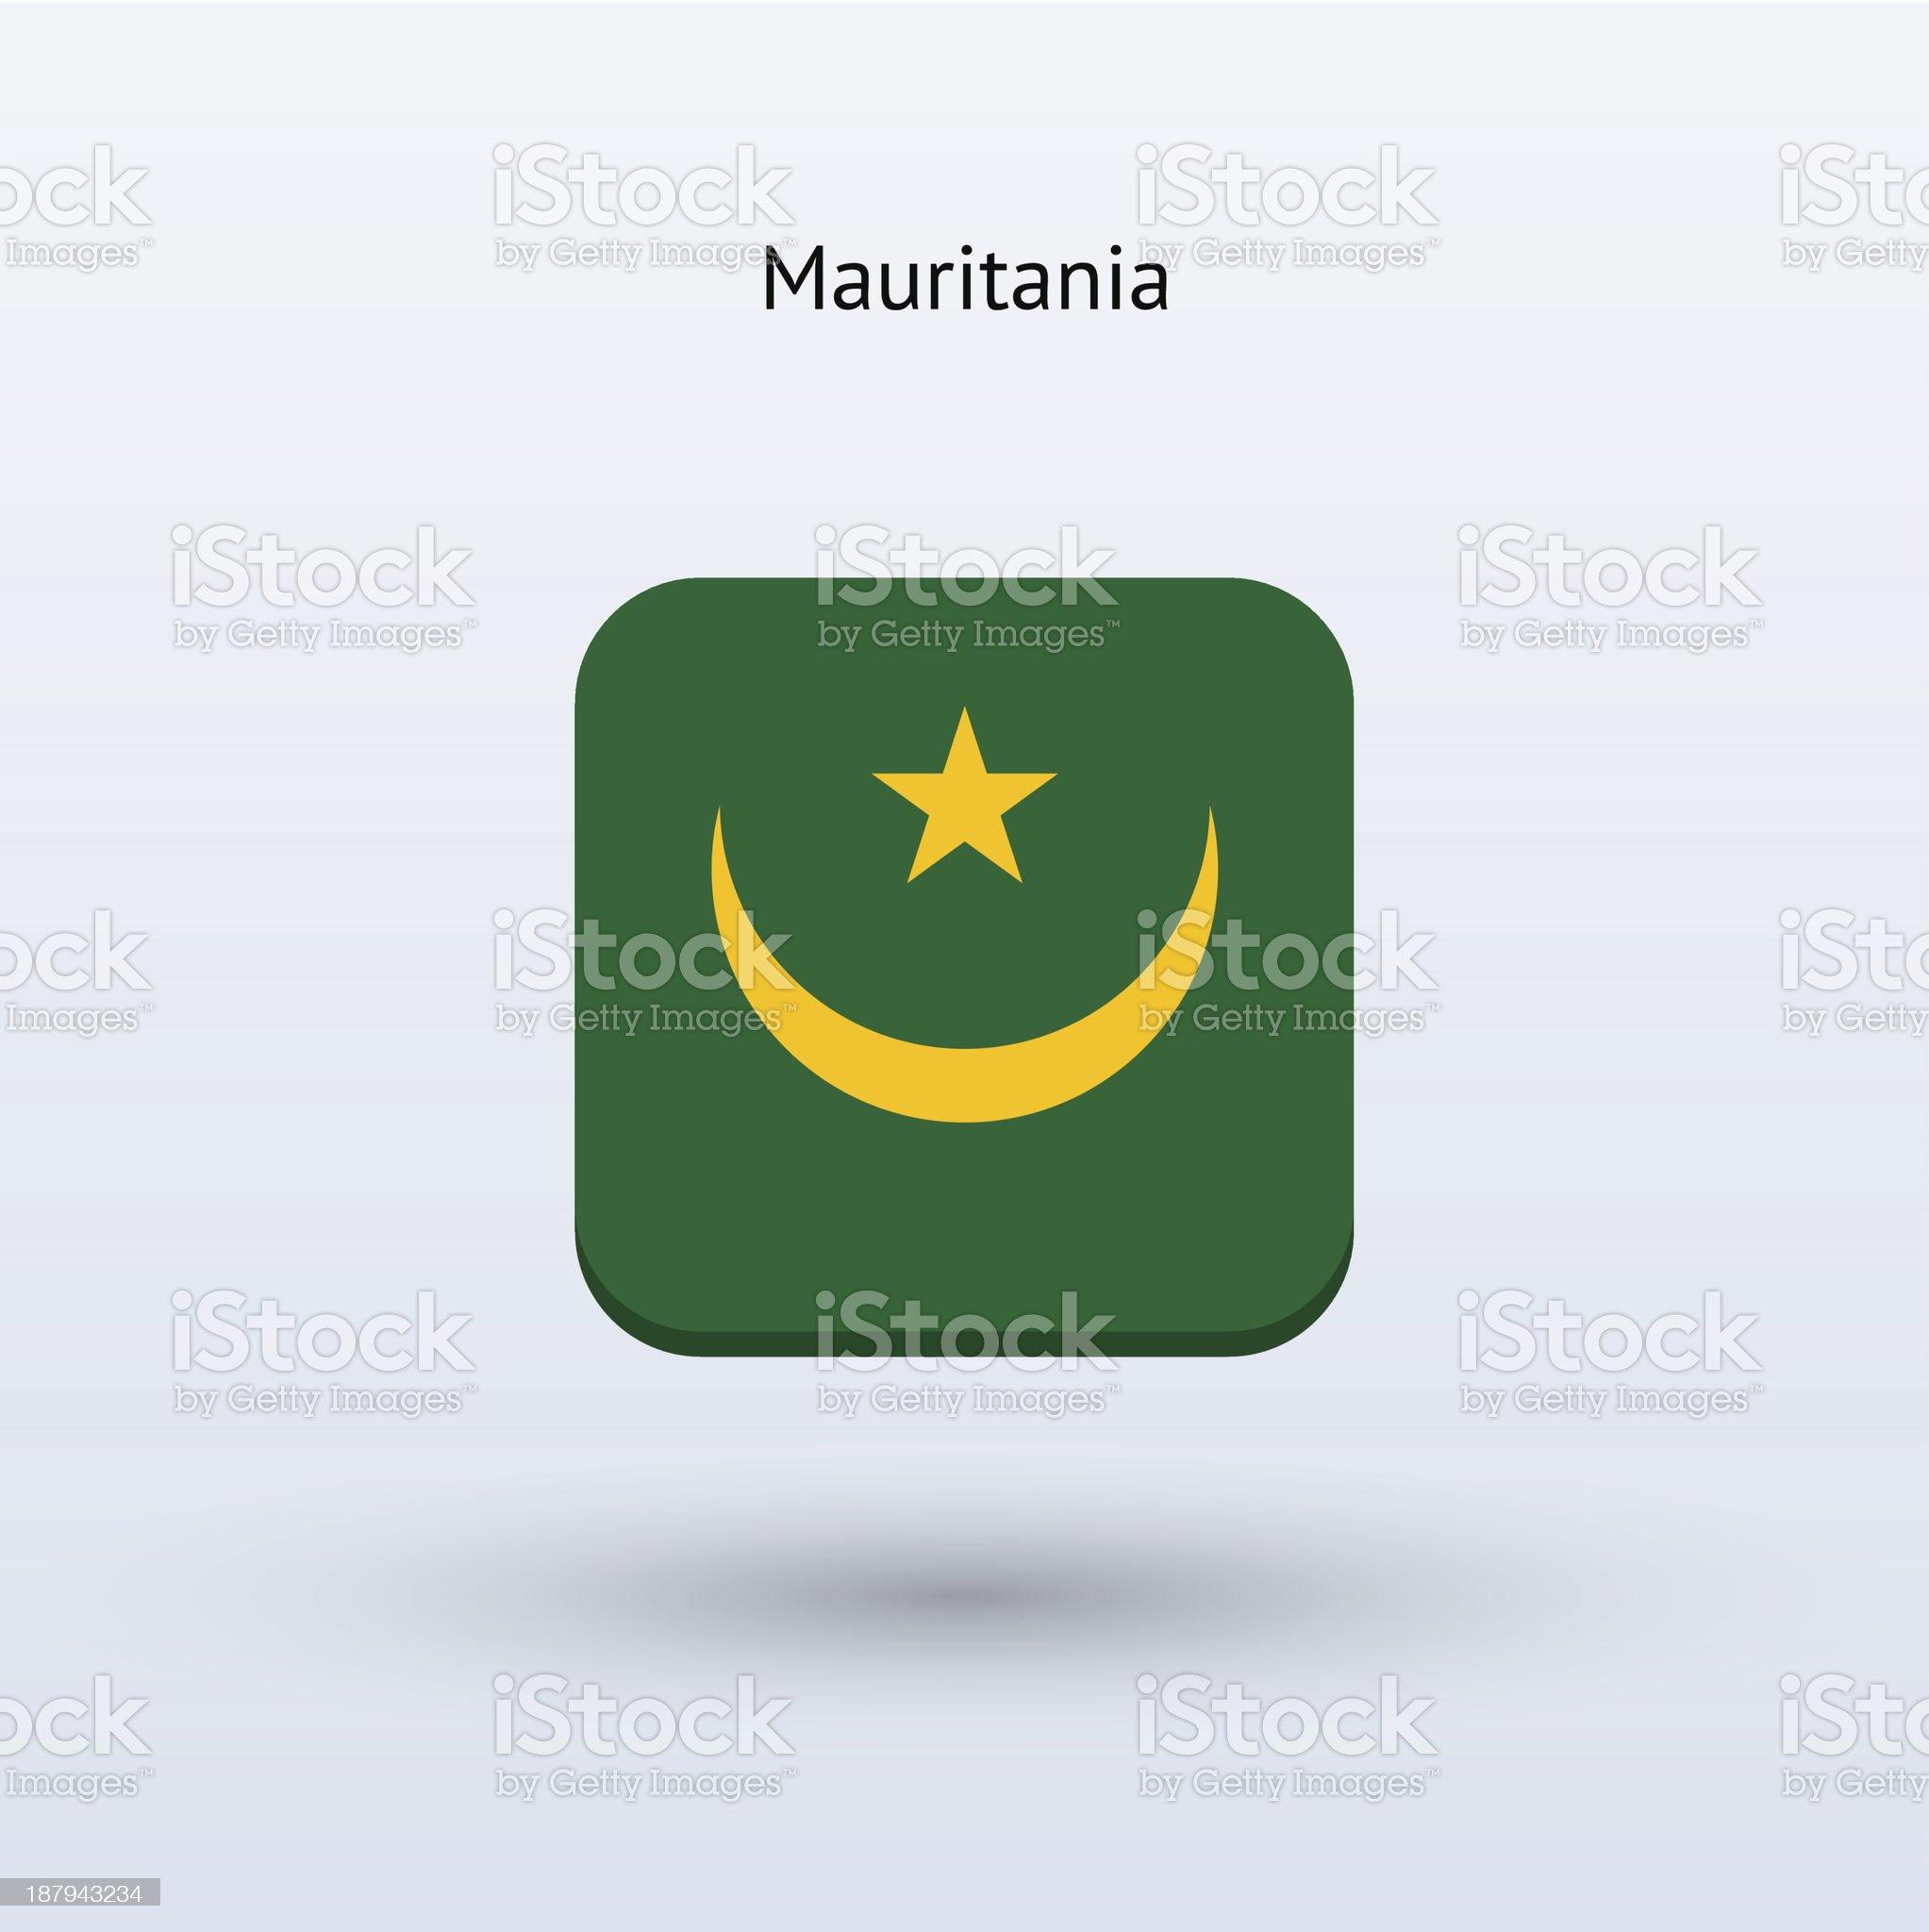 Mauritania Flag Icon royalty-free stock vector art